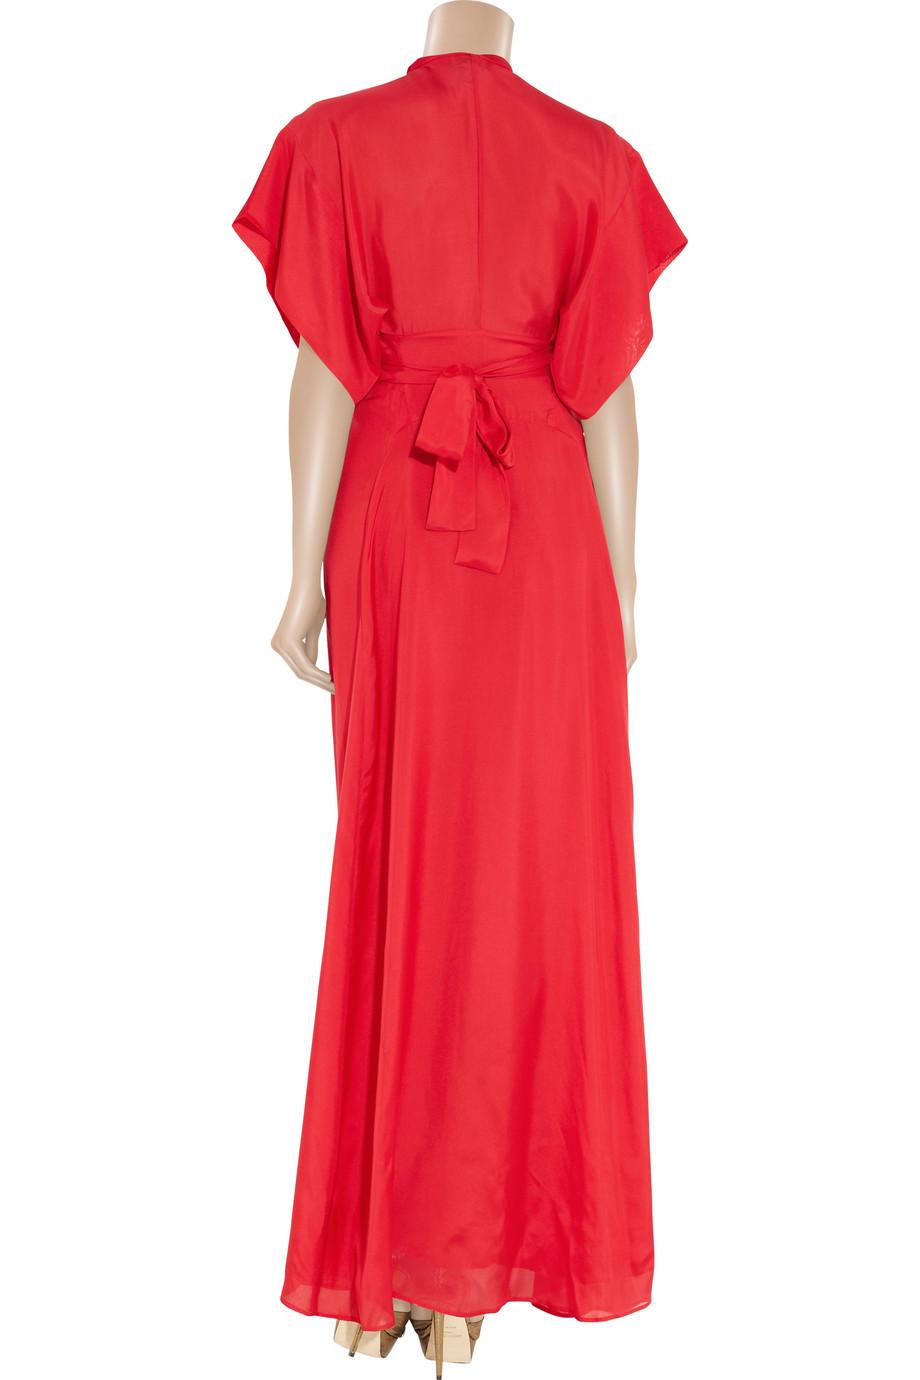 Lyst Issa Silk Satin Kimono Maxi Dress In Red